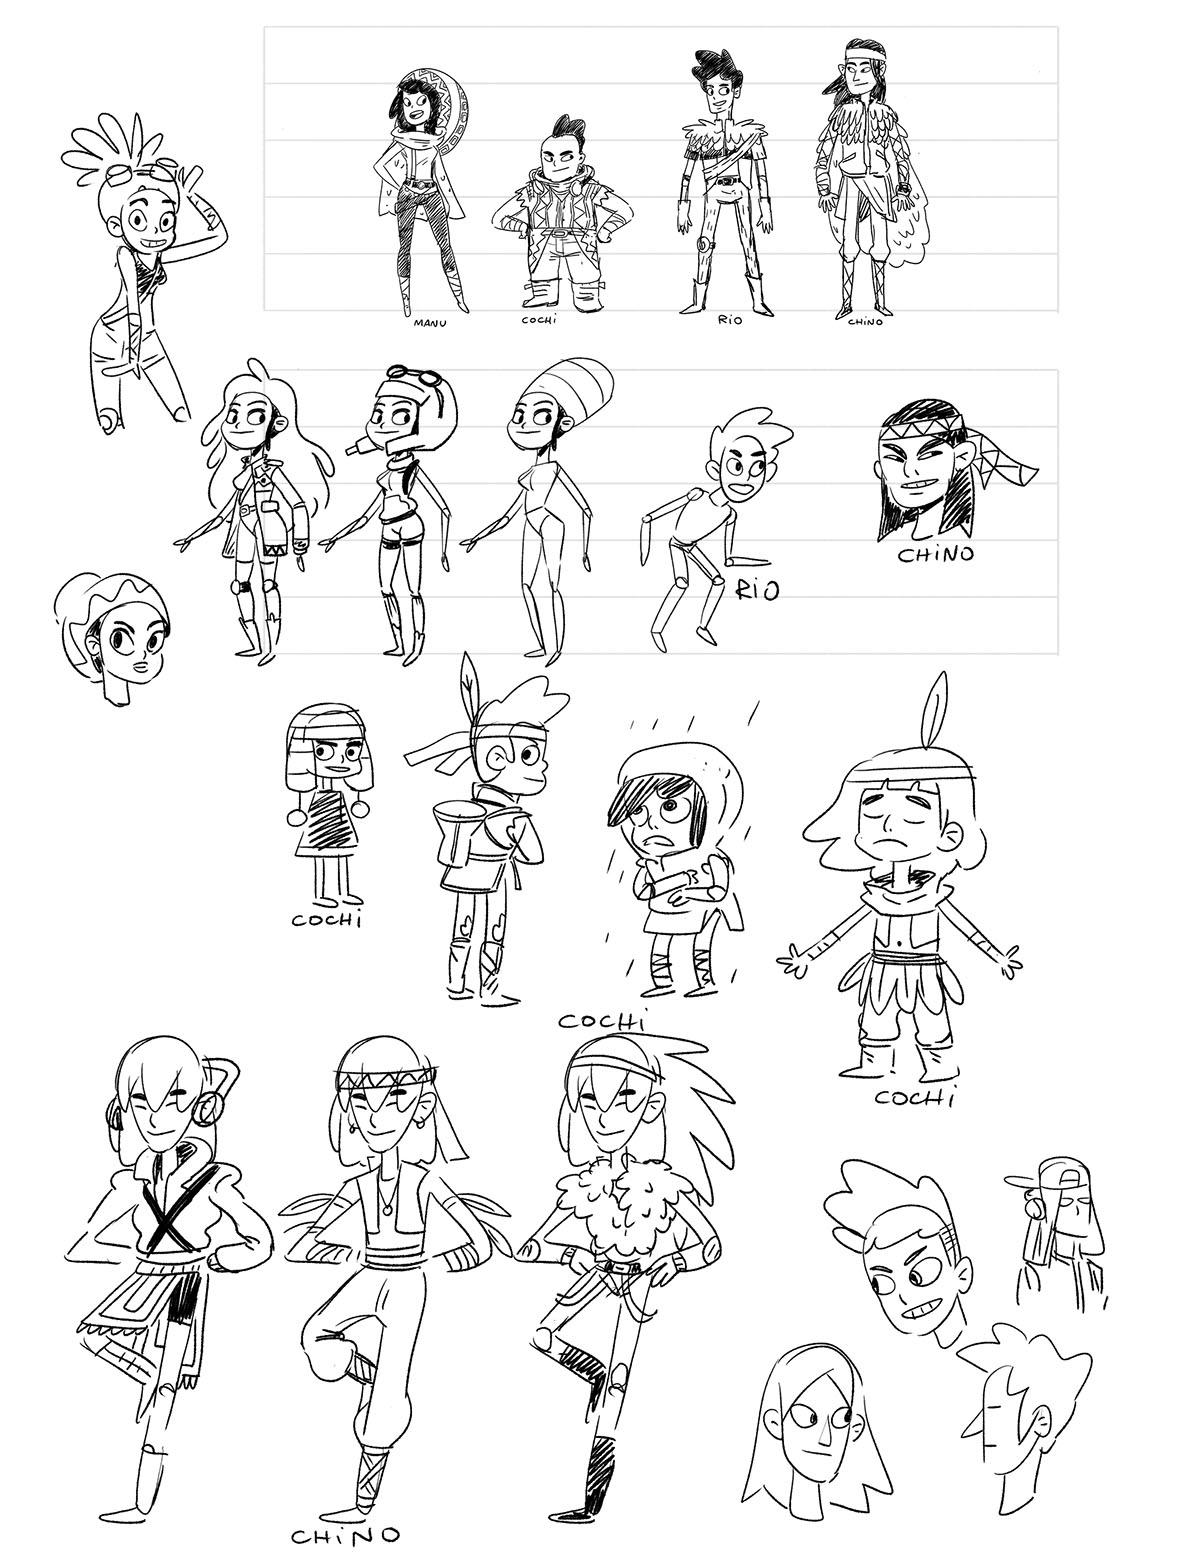 personajess1.jpg